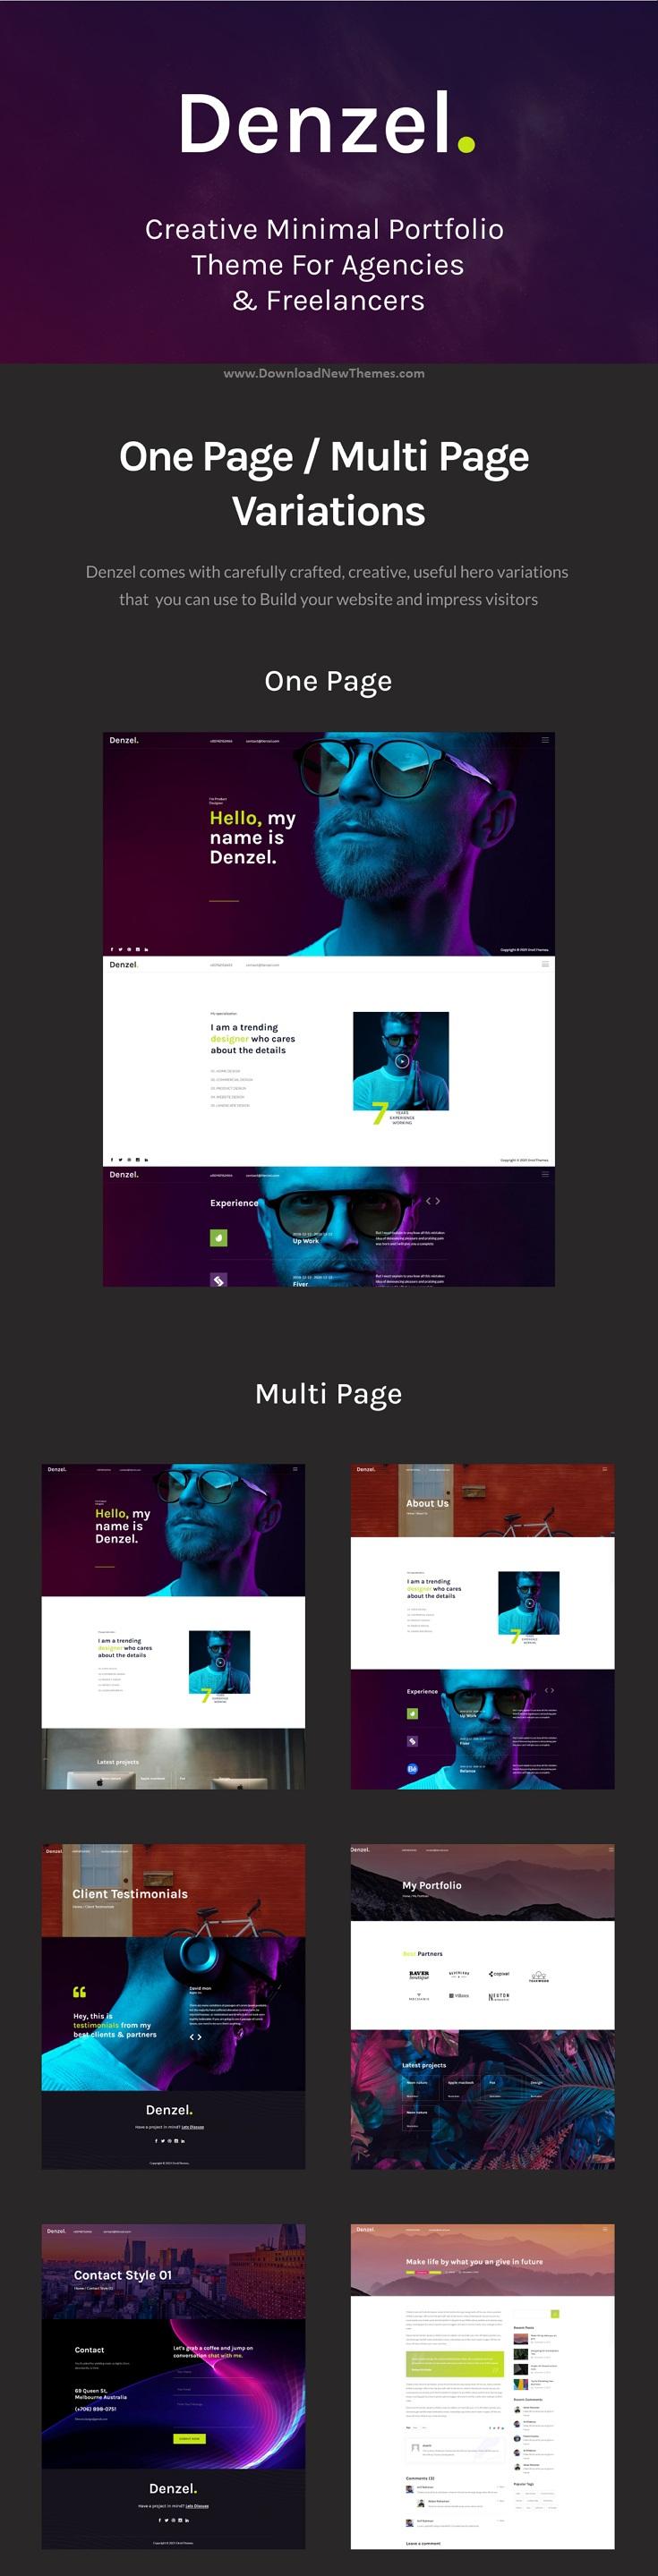 Creative Minimal Portfolio WordPress Theme